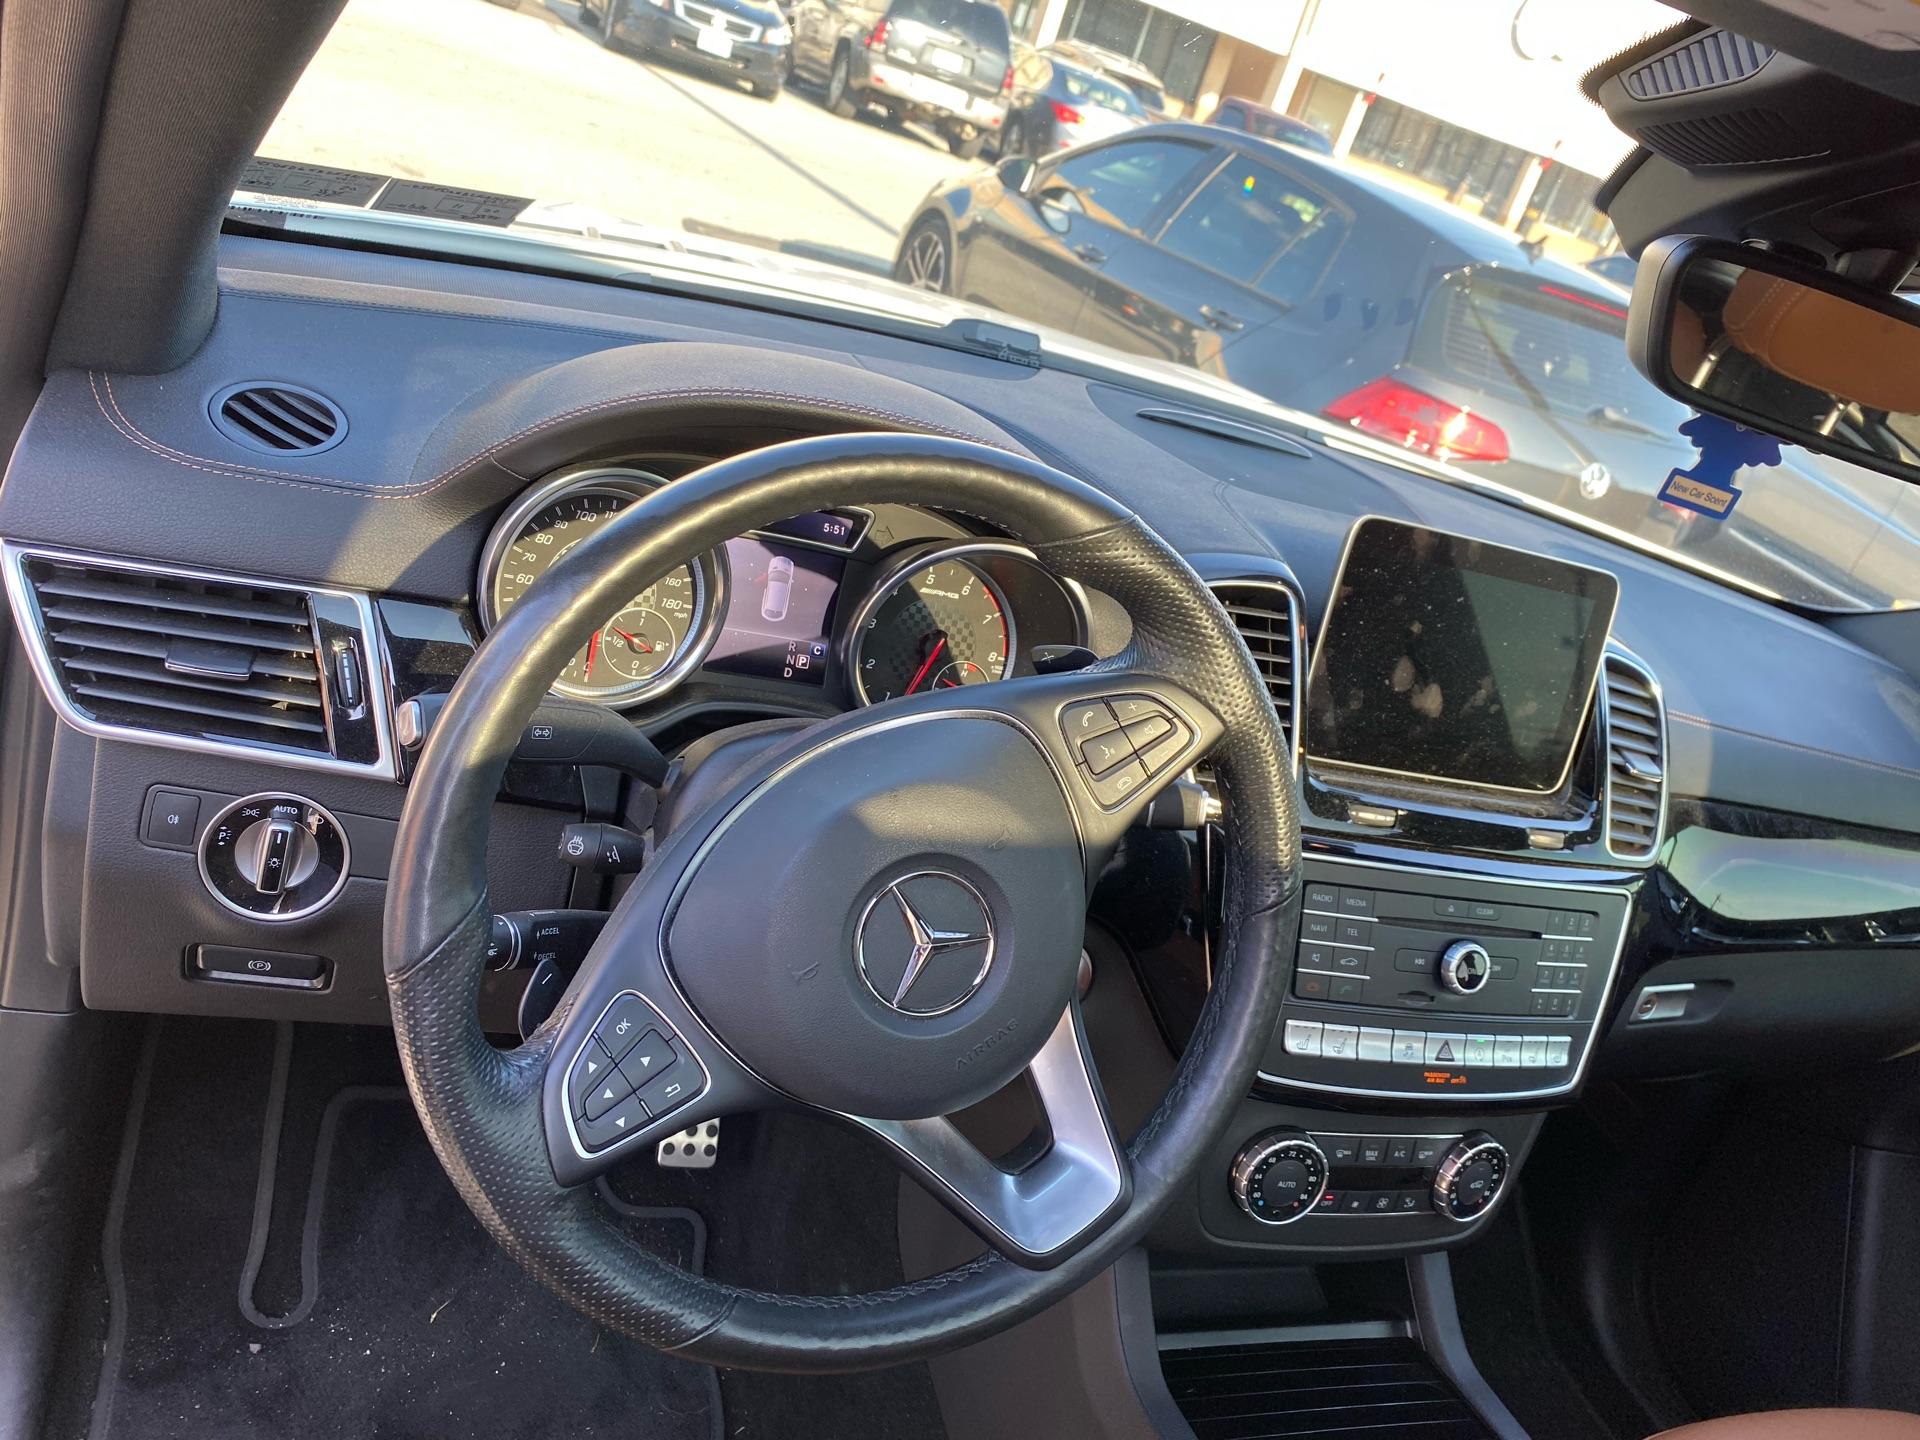 2019 Mercedes-Benz GLE - photo 5